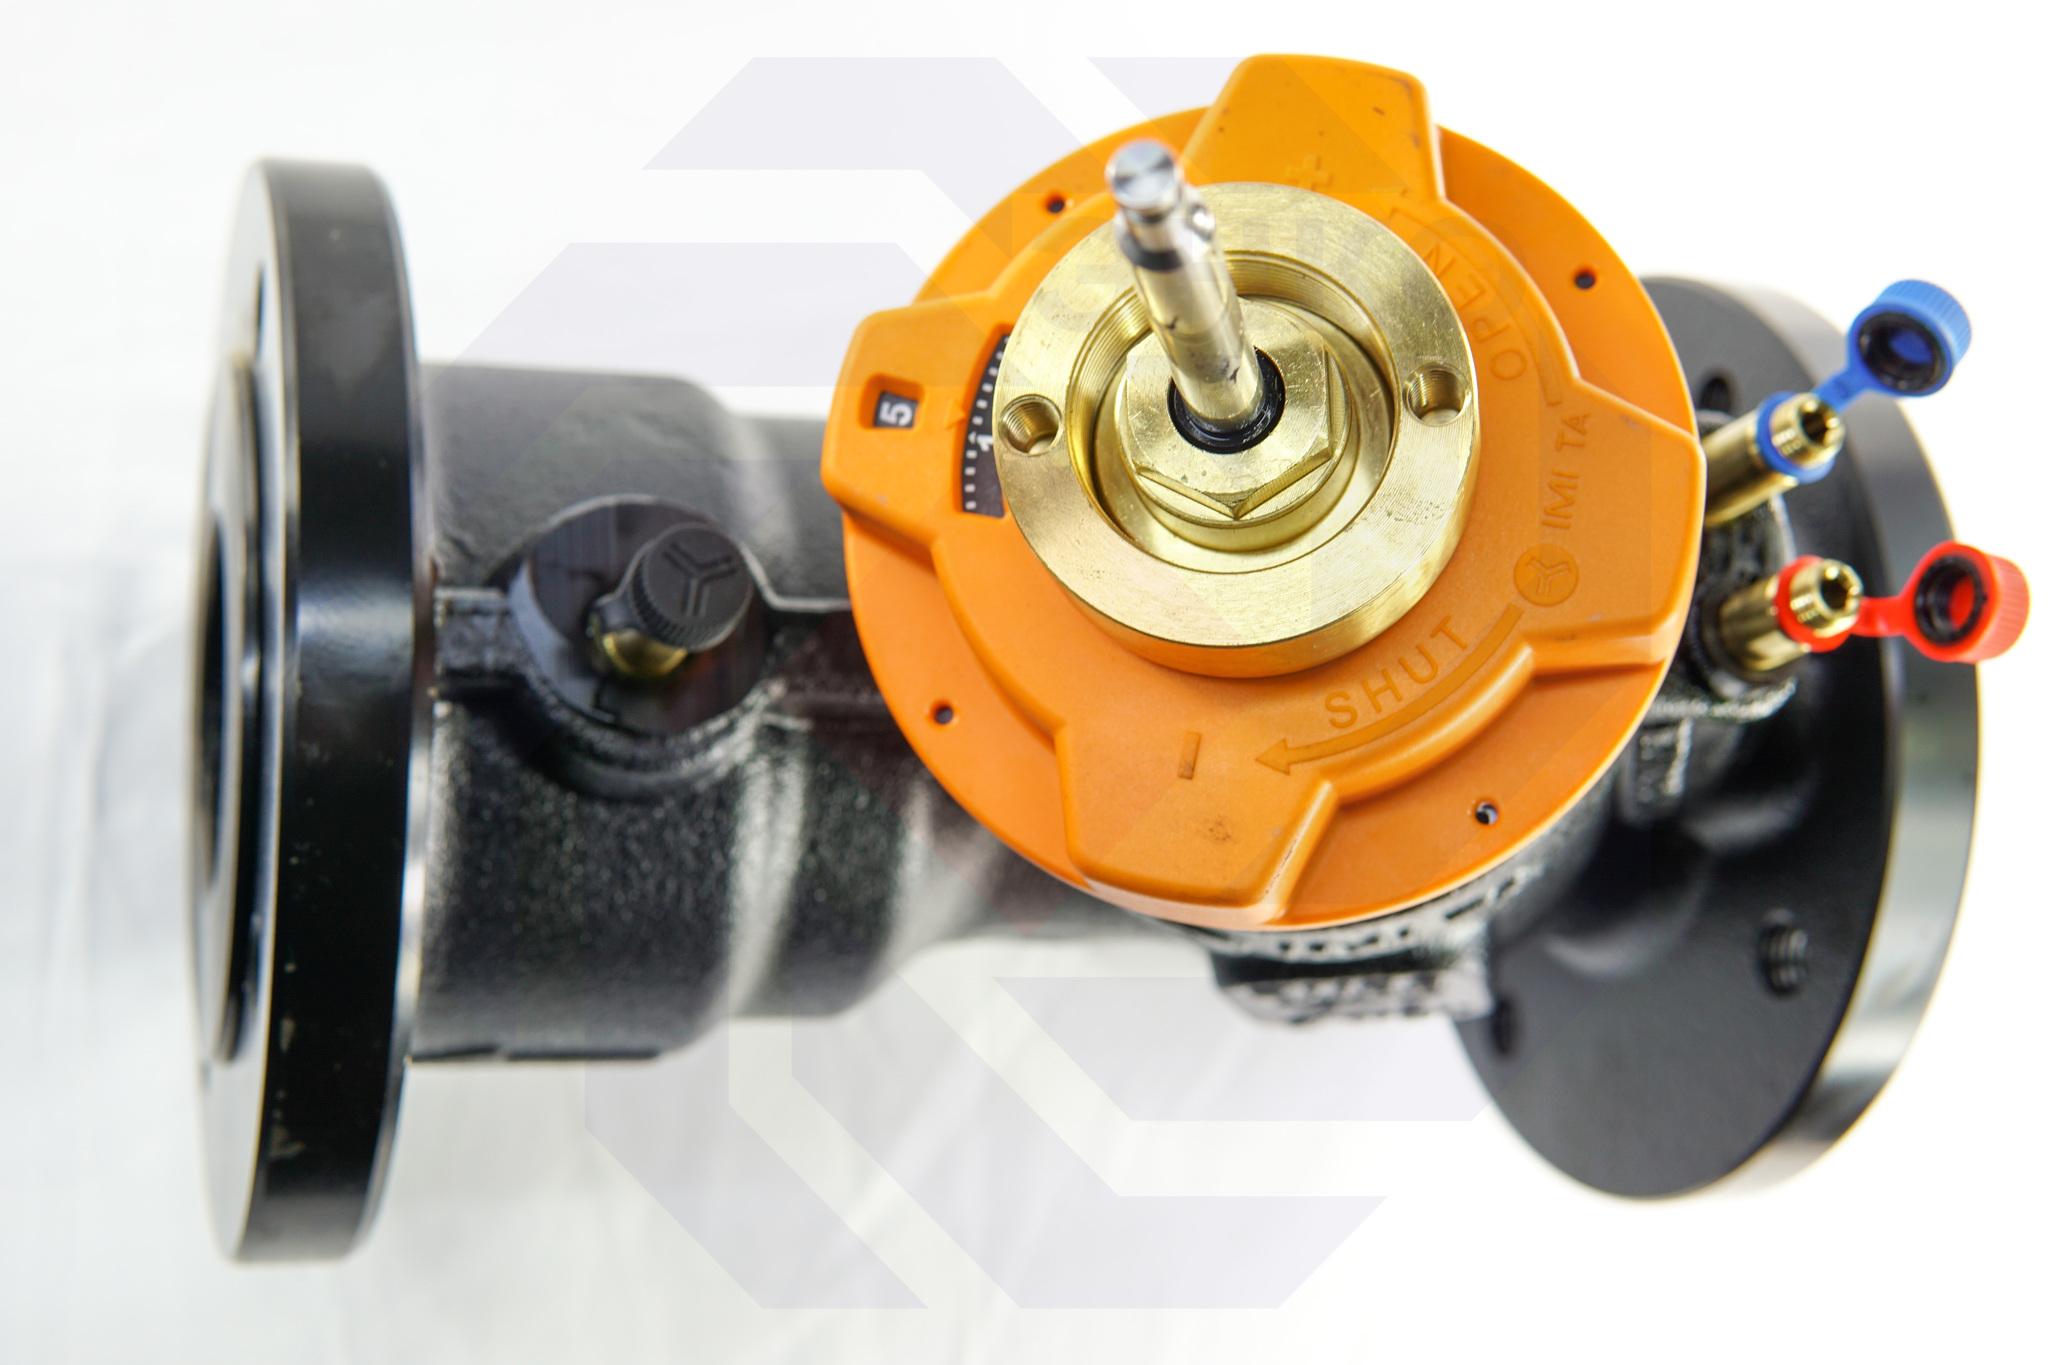 Клапан балансировочный и регулирующий IMI TA-Modulator DN 65